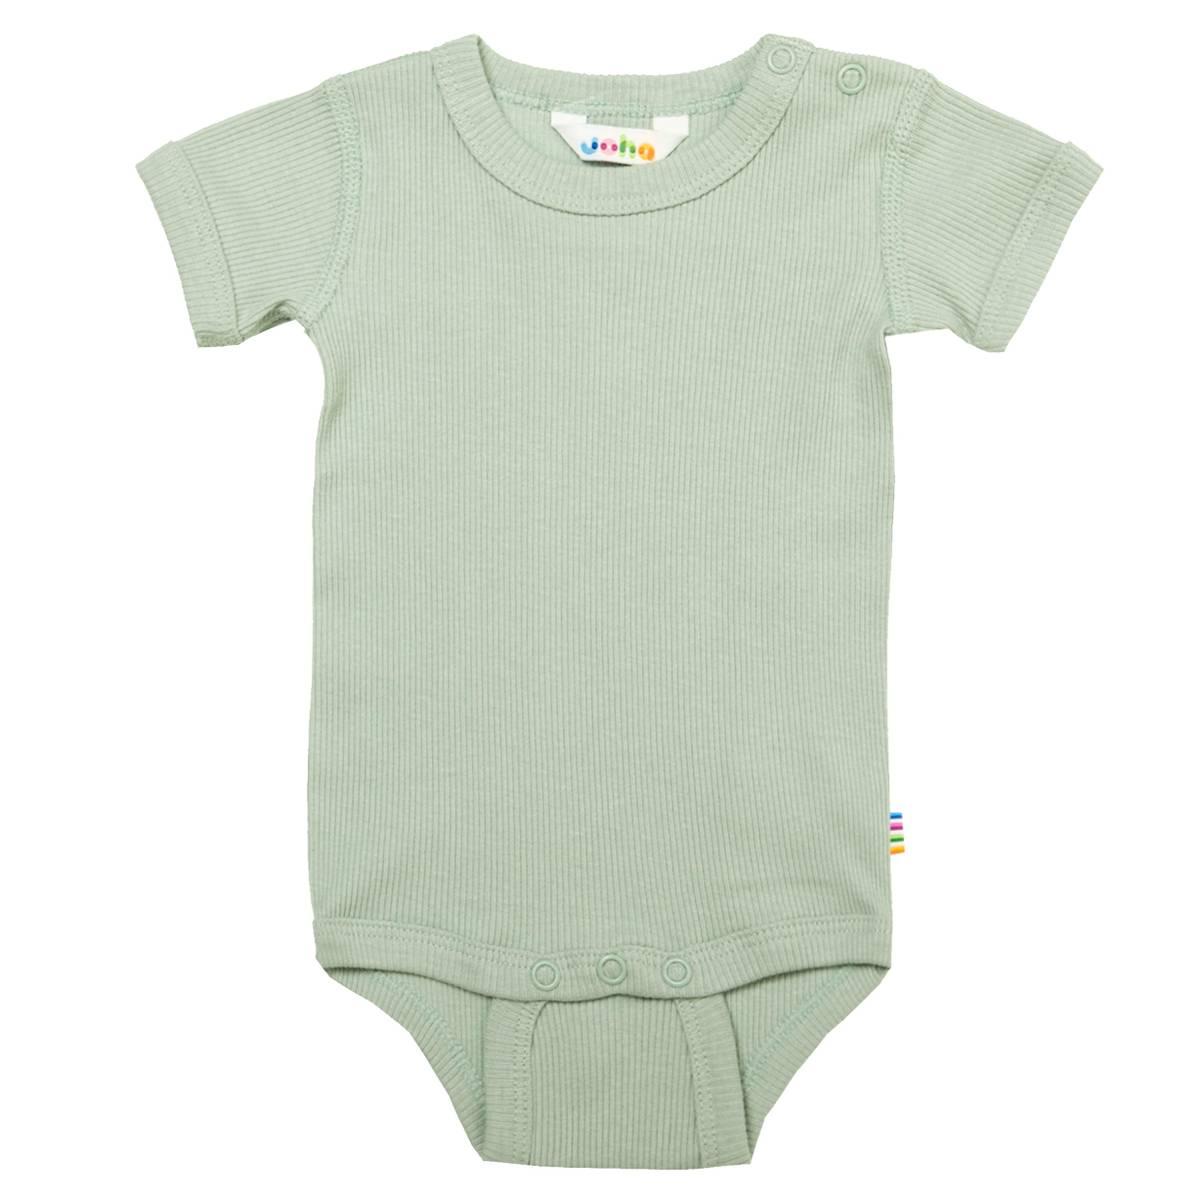 Joha Cotton Rib kortermet body - lys grønn